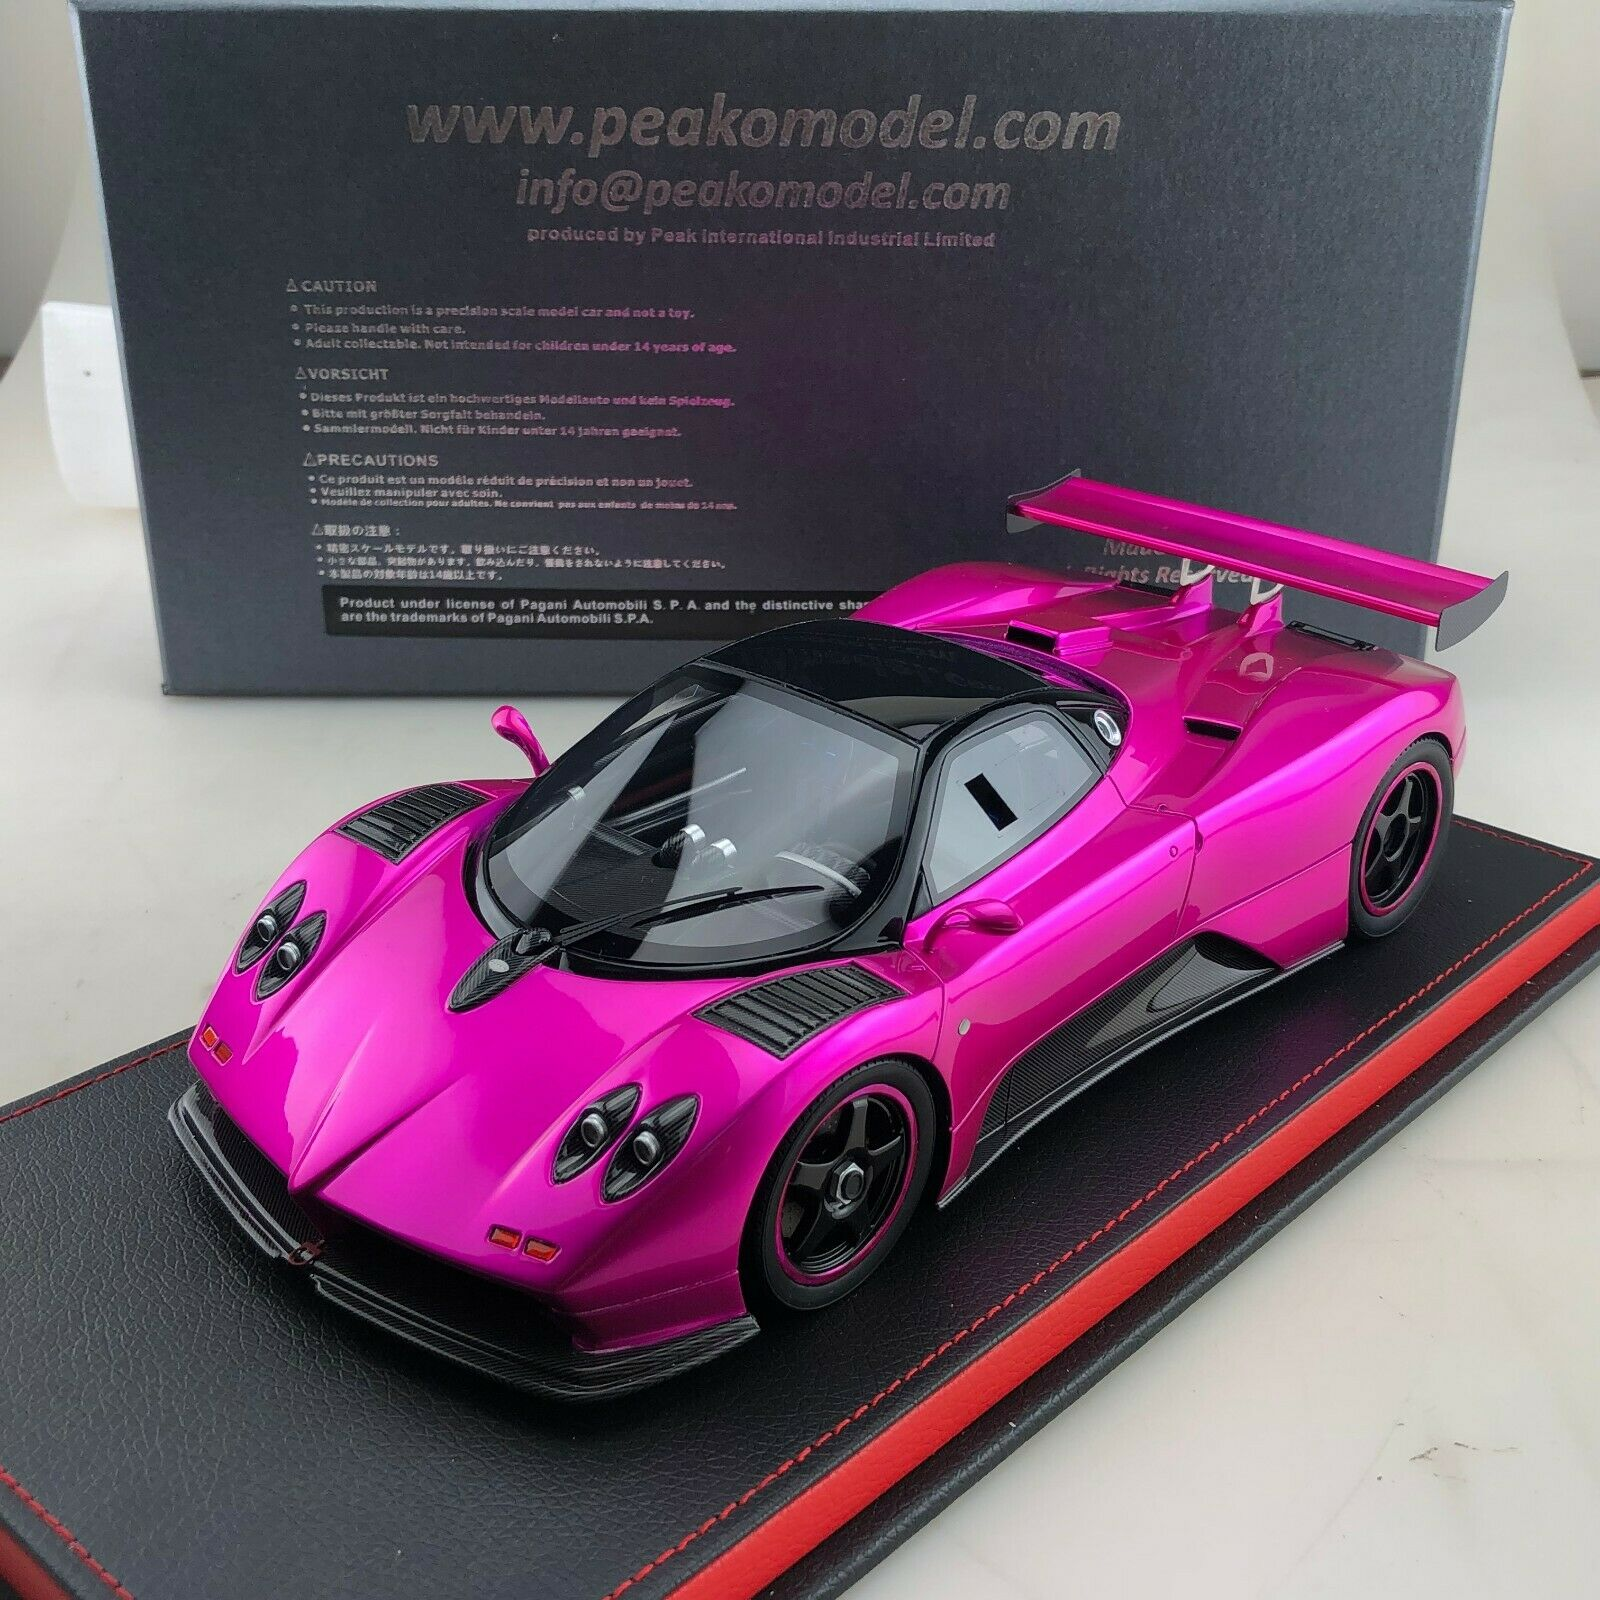 1 18 Peako Pagani Zonda C12 Monza Flash rose limited 30 pcs